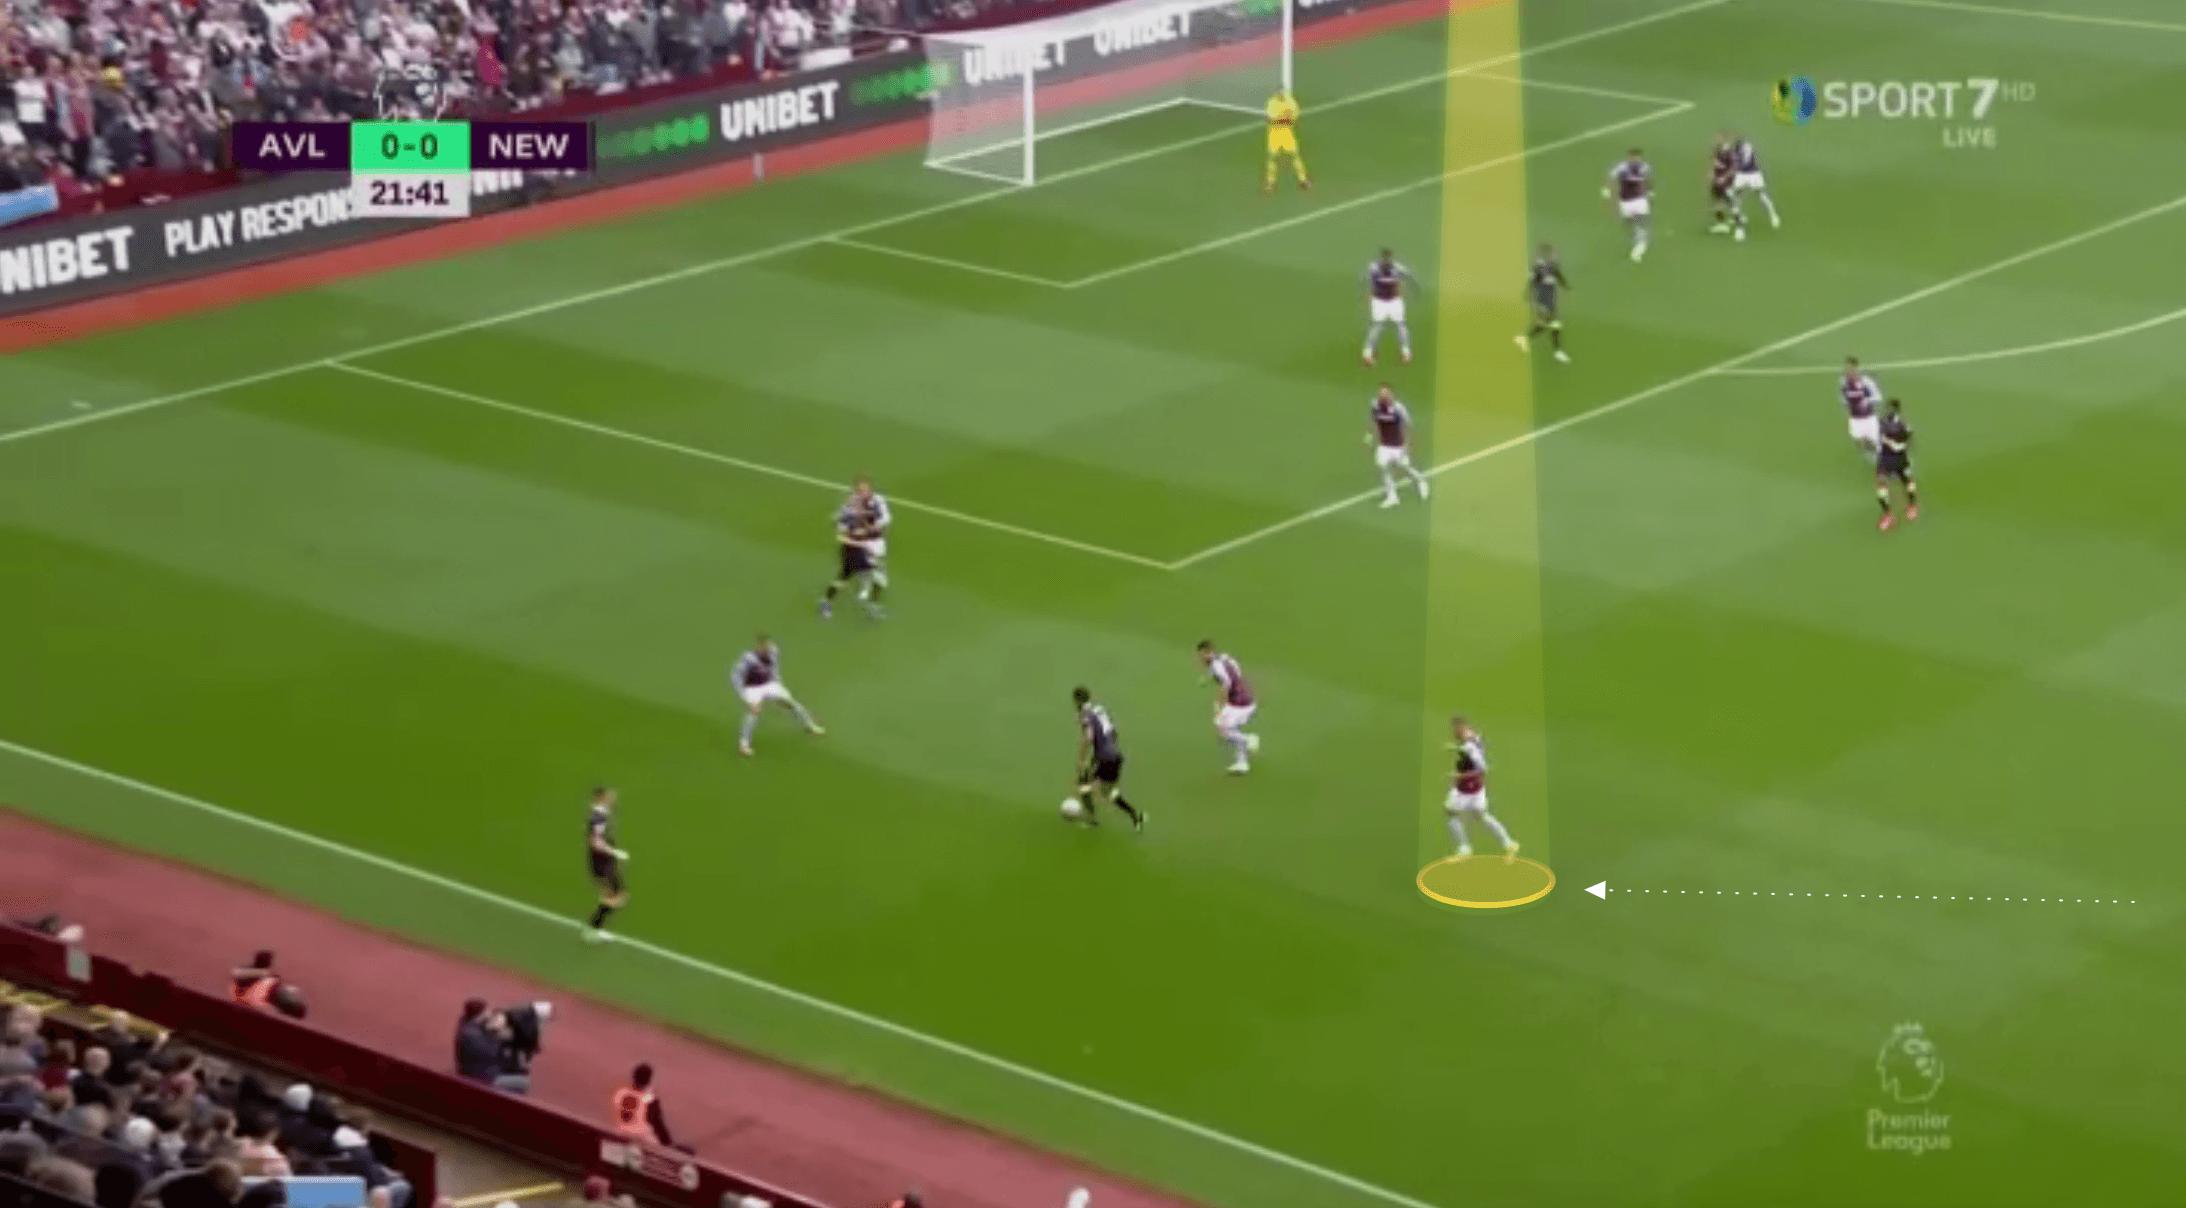 EPL 2021/22: Danny Ings at Aston Villa - scout report tactical analysis tactics